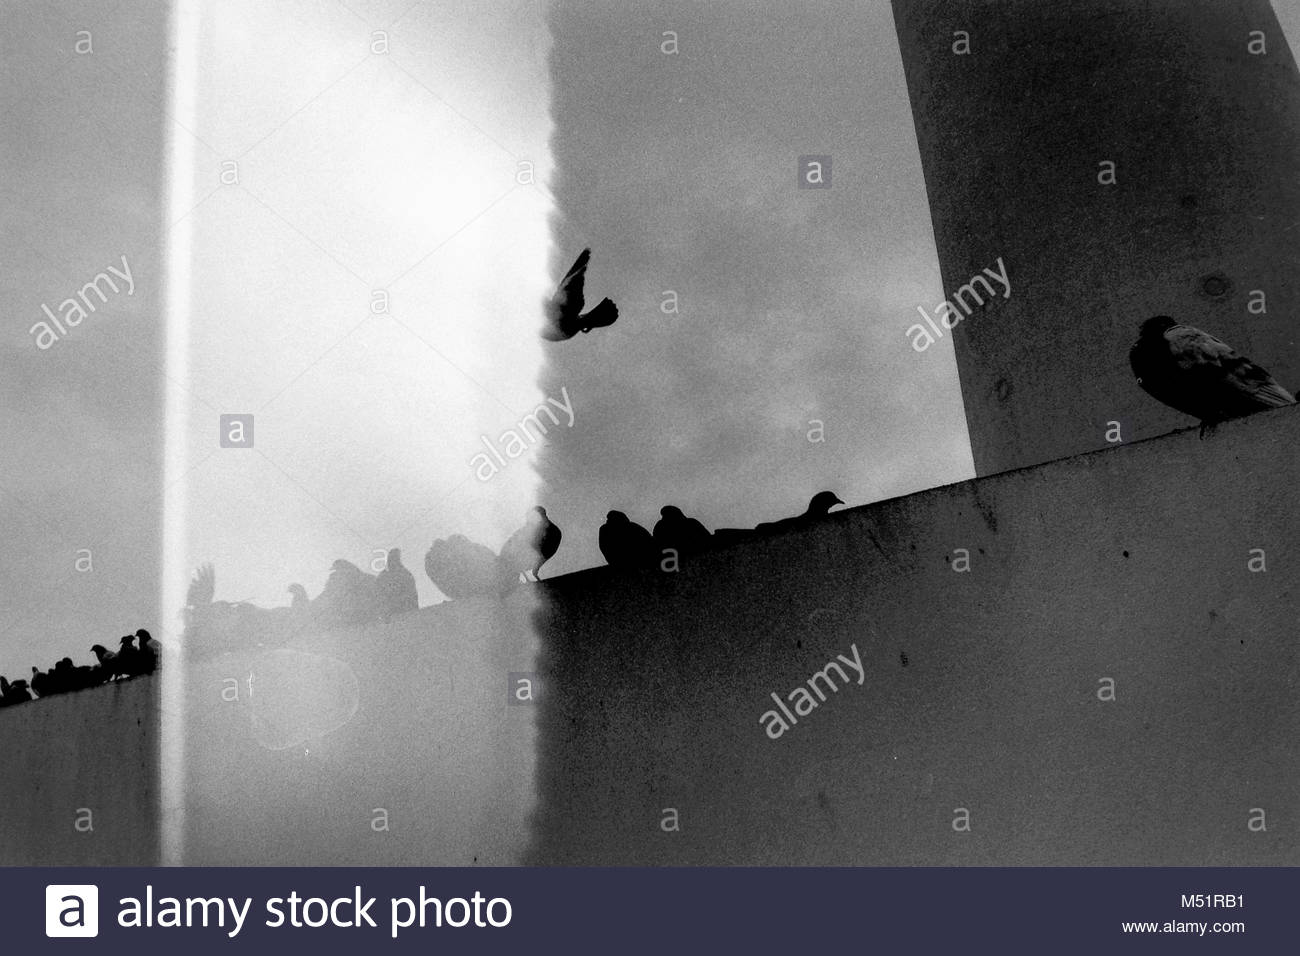 Berlin Alexanderplatz - Fernsehturm Stockbild